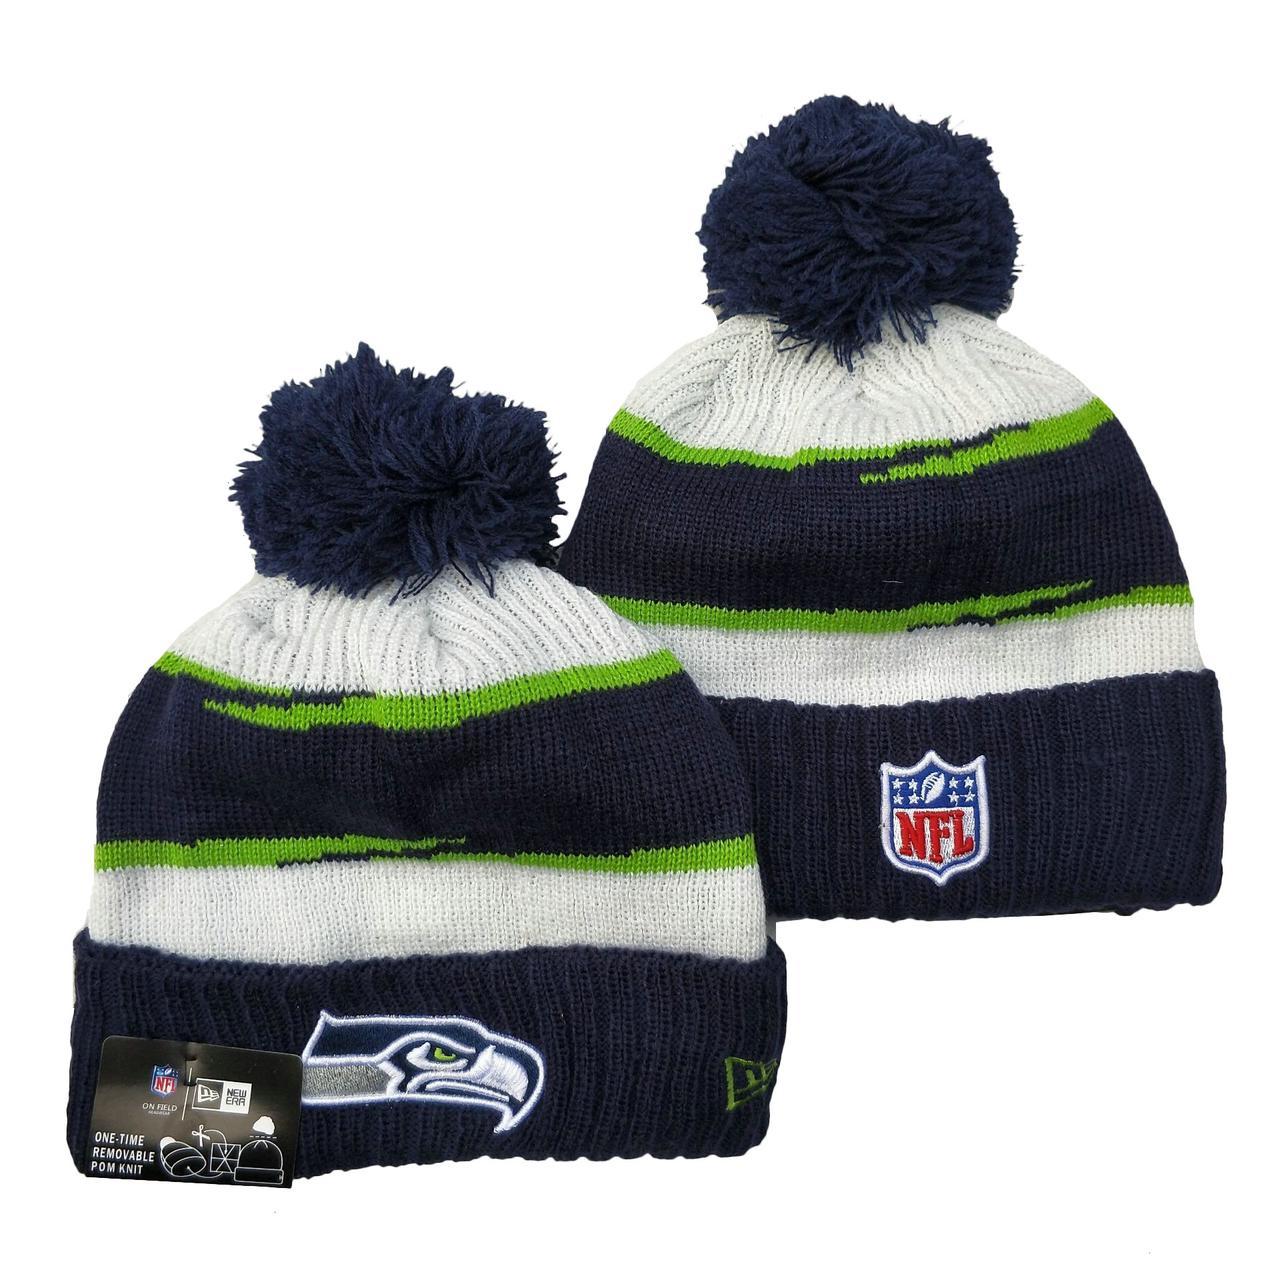 Шапка зимняя Seattle Seahawks / SPK-198 (Реплика)